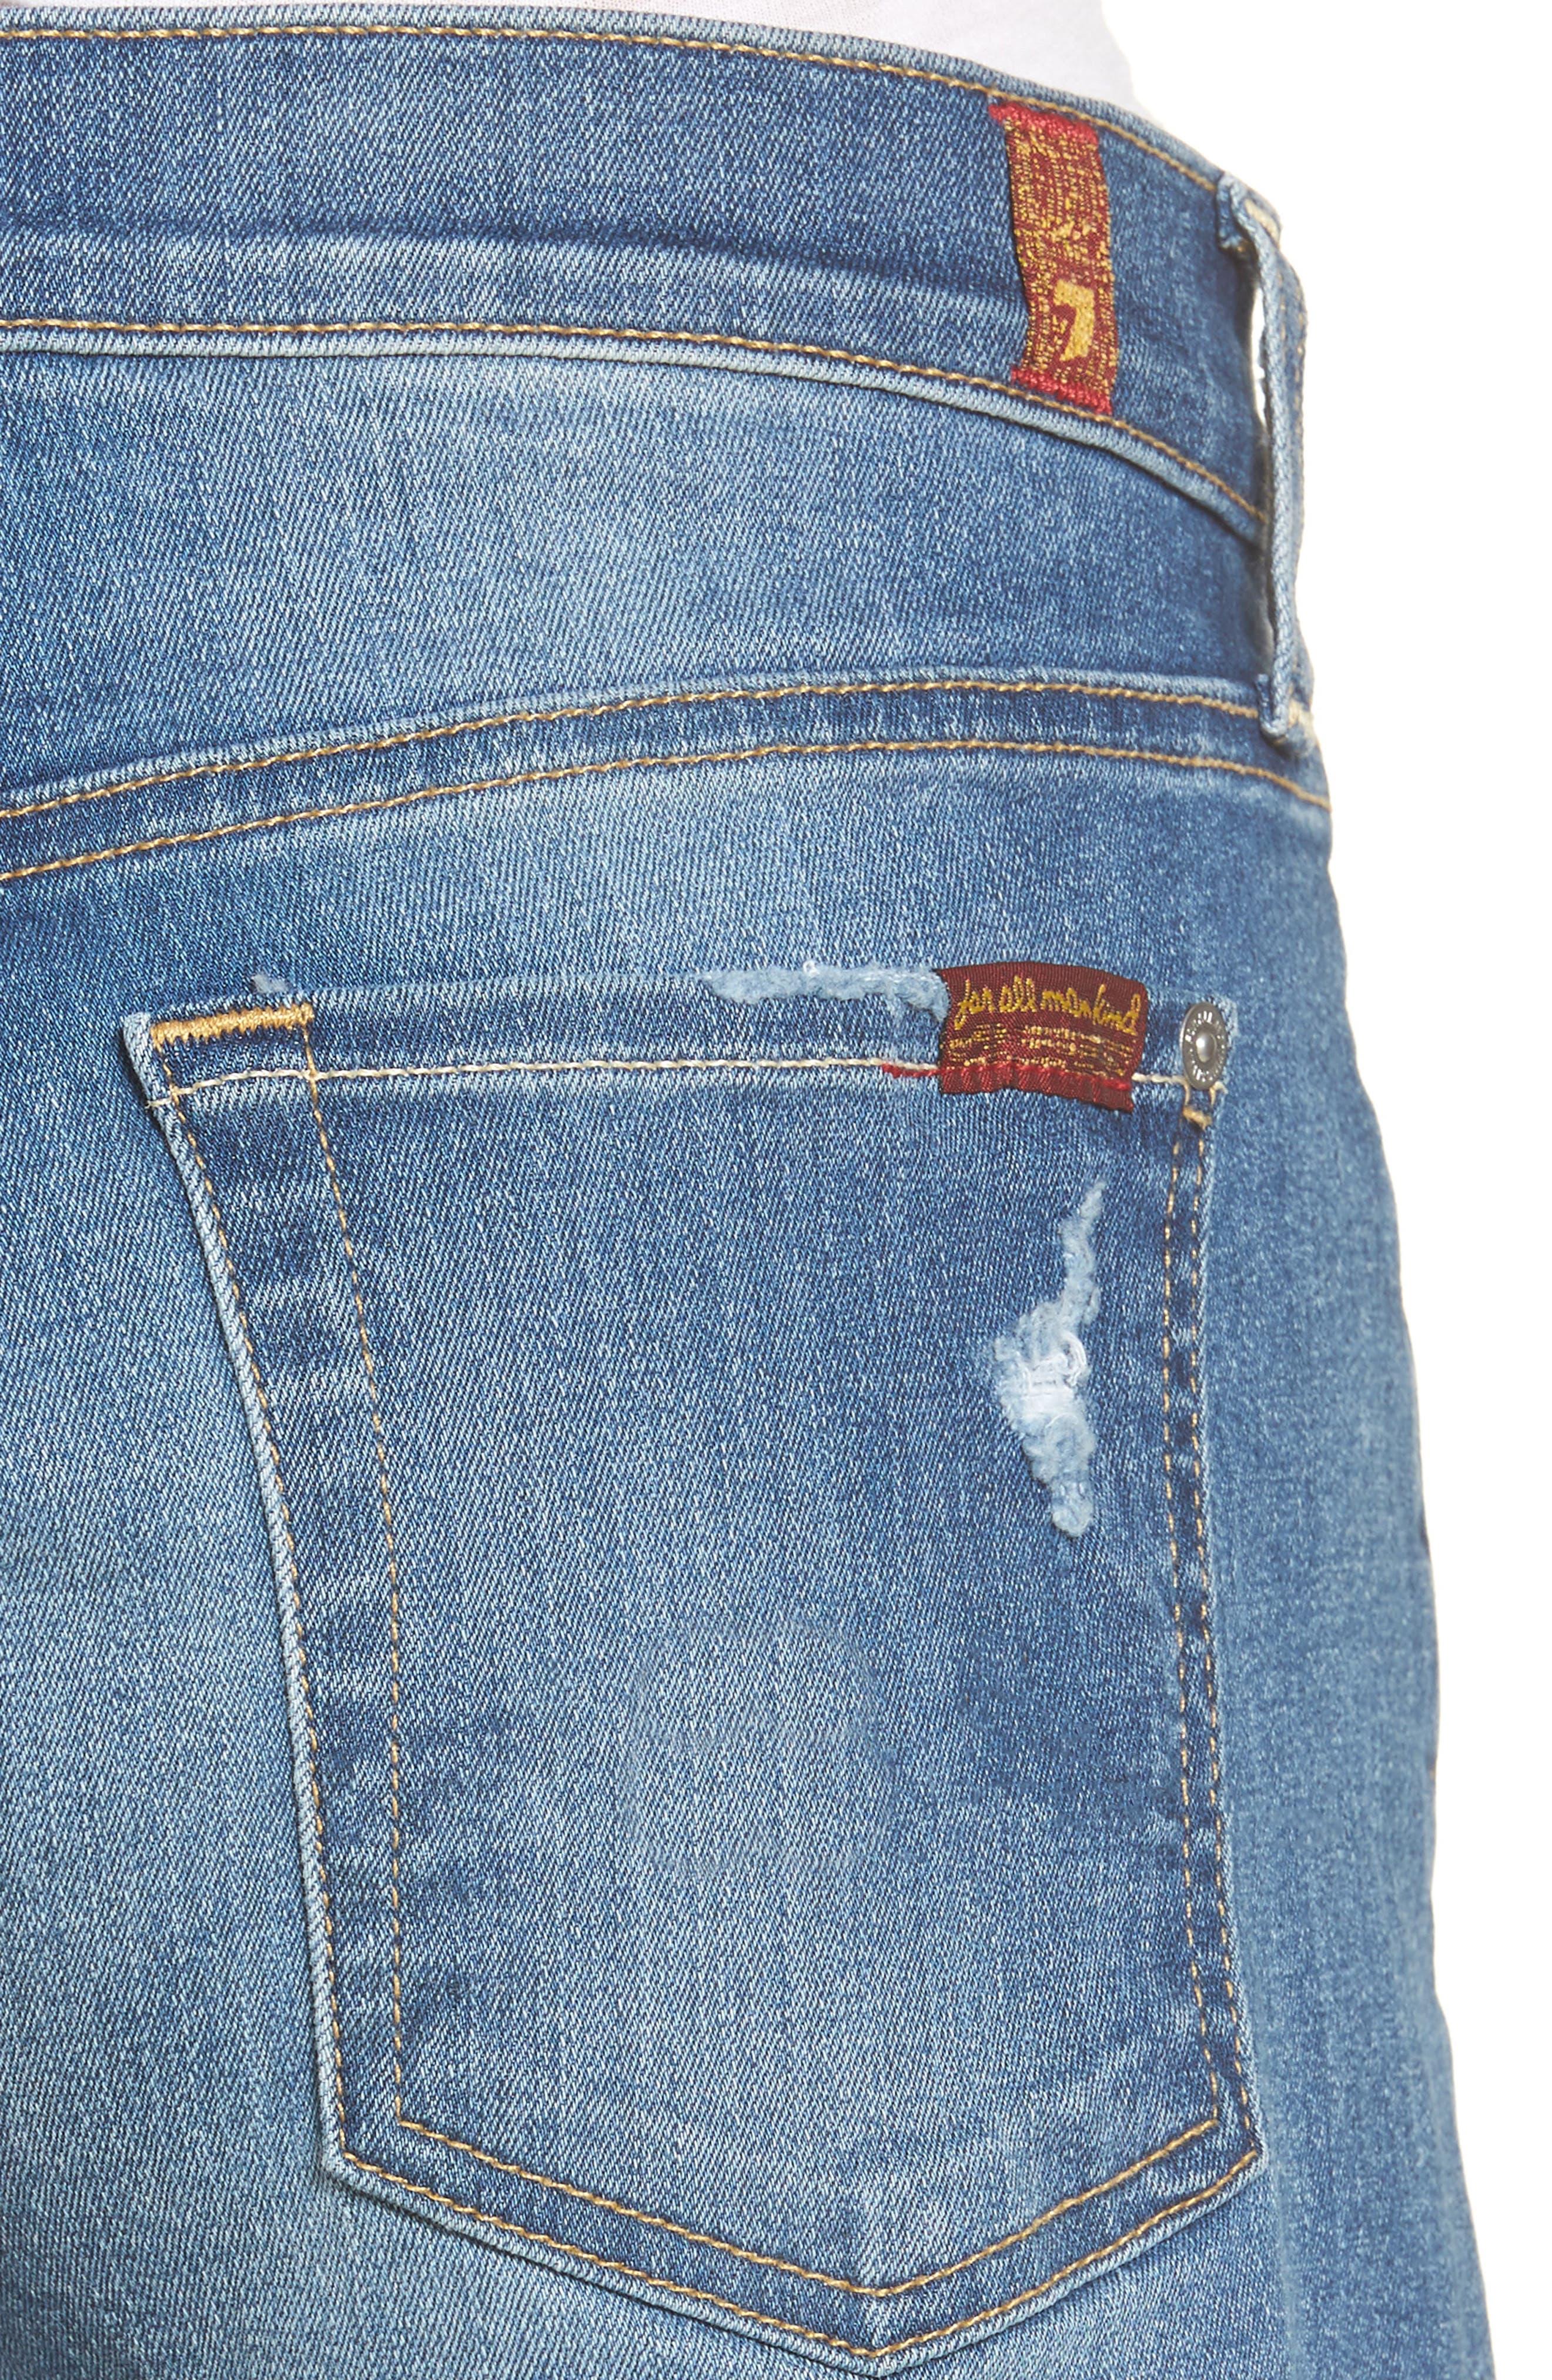 High Waist Cutoff Denim Shorts,                             Alternate thumbnail 4, color,                             Ocean Mist